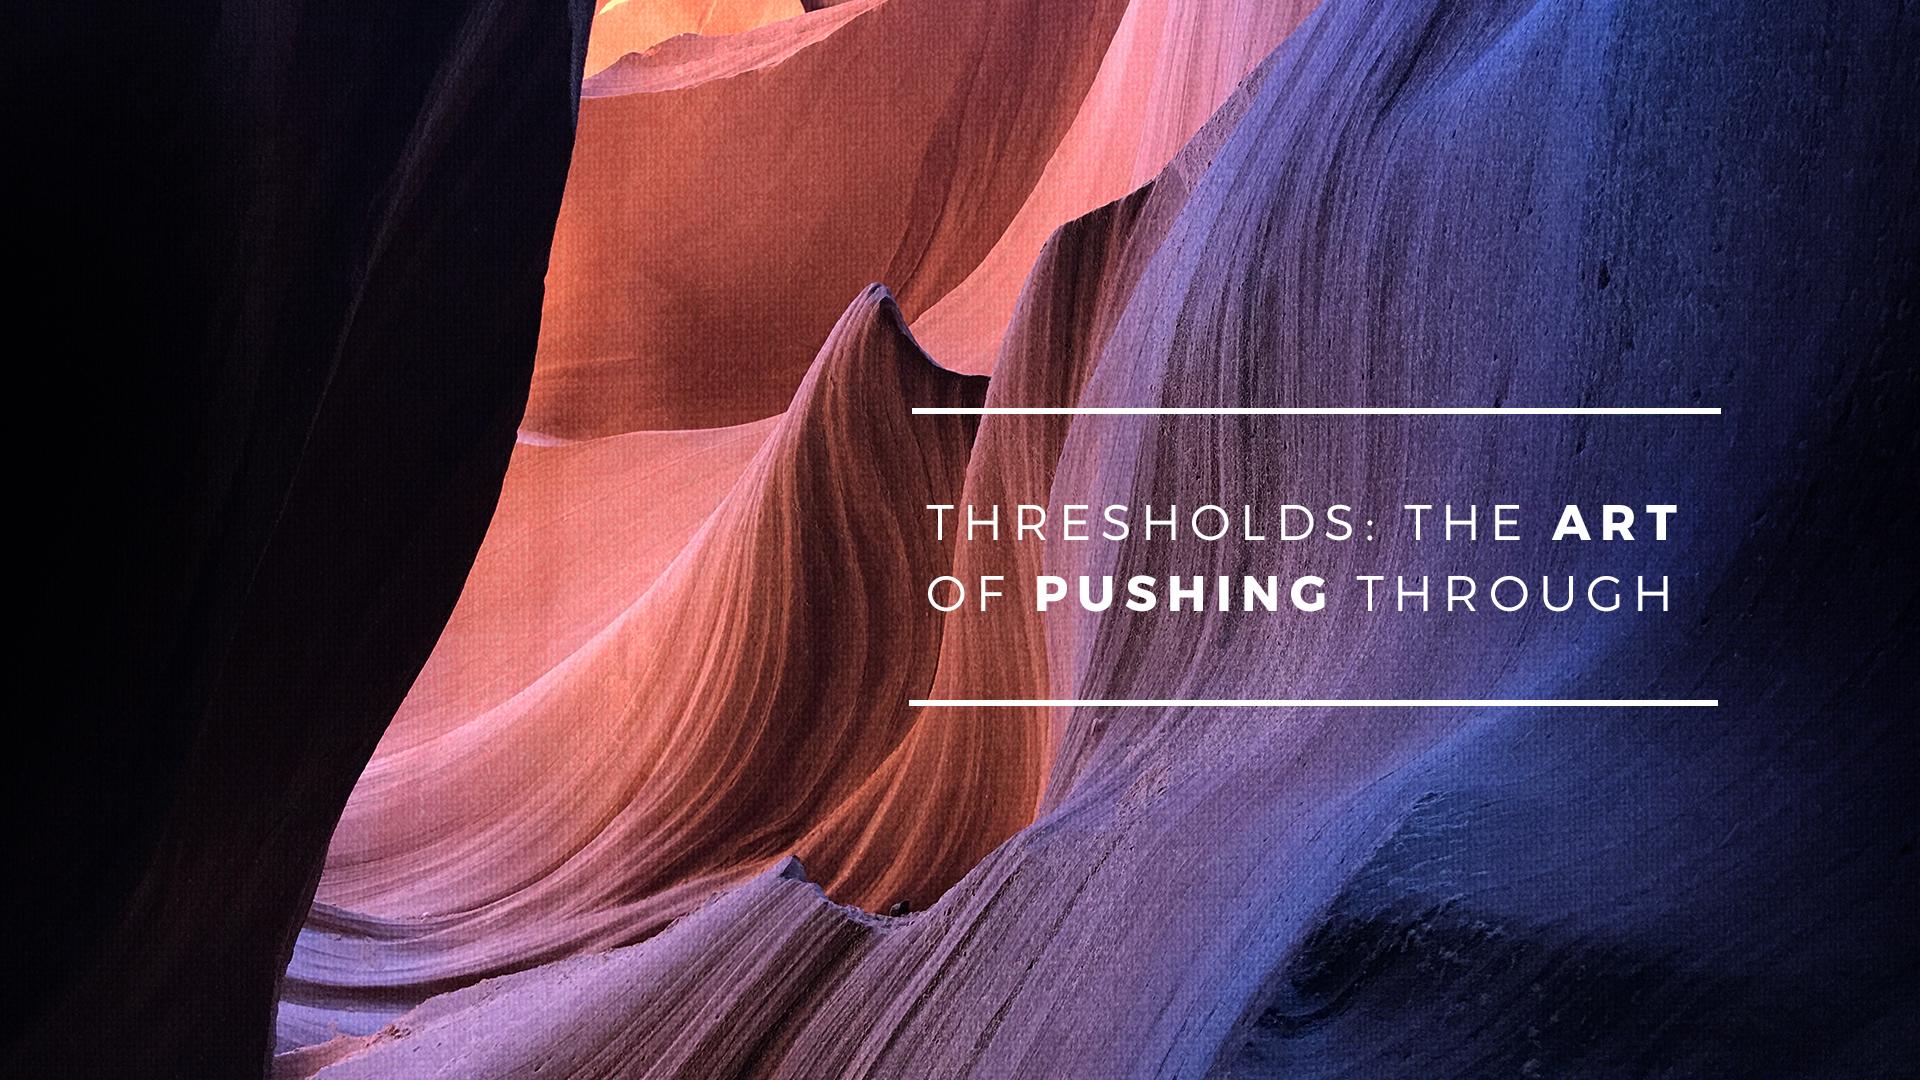 thresholds_title.jpg